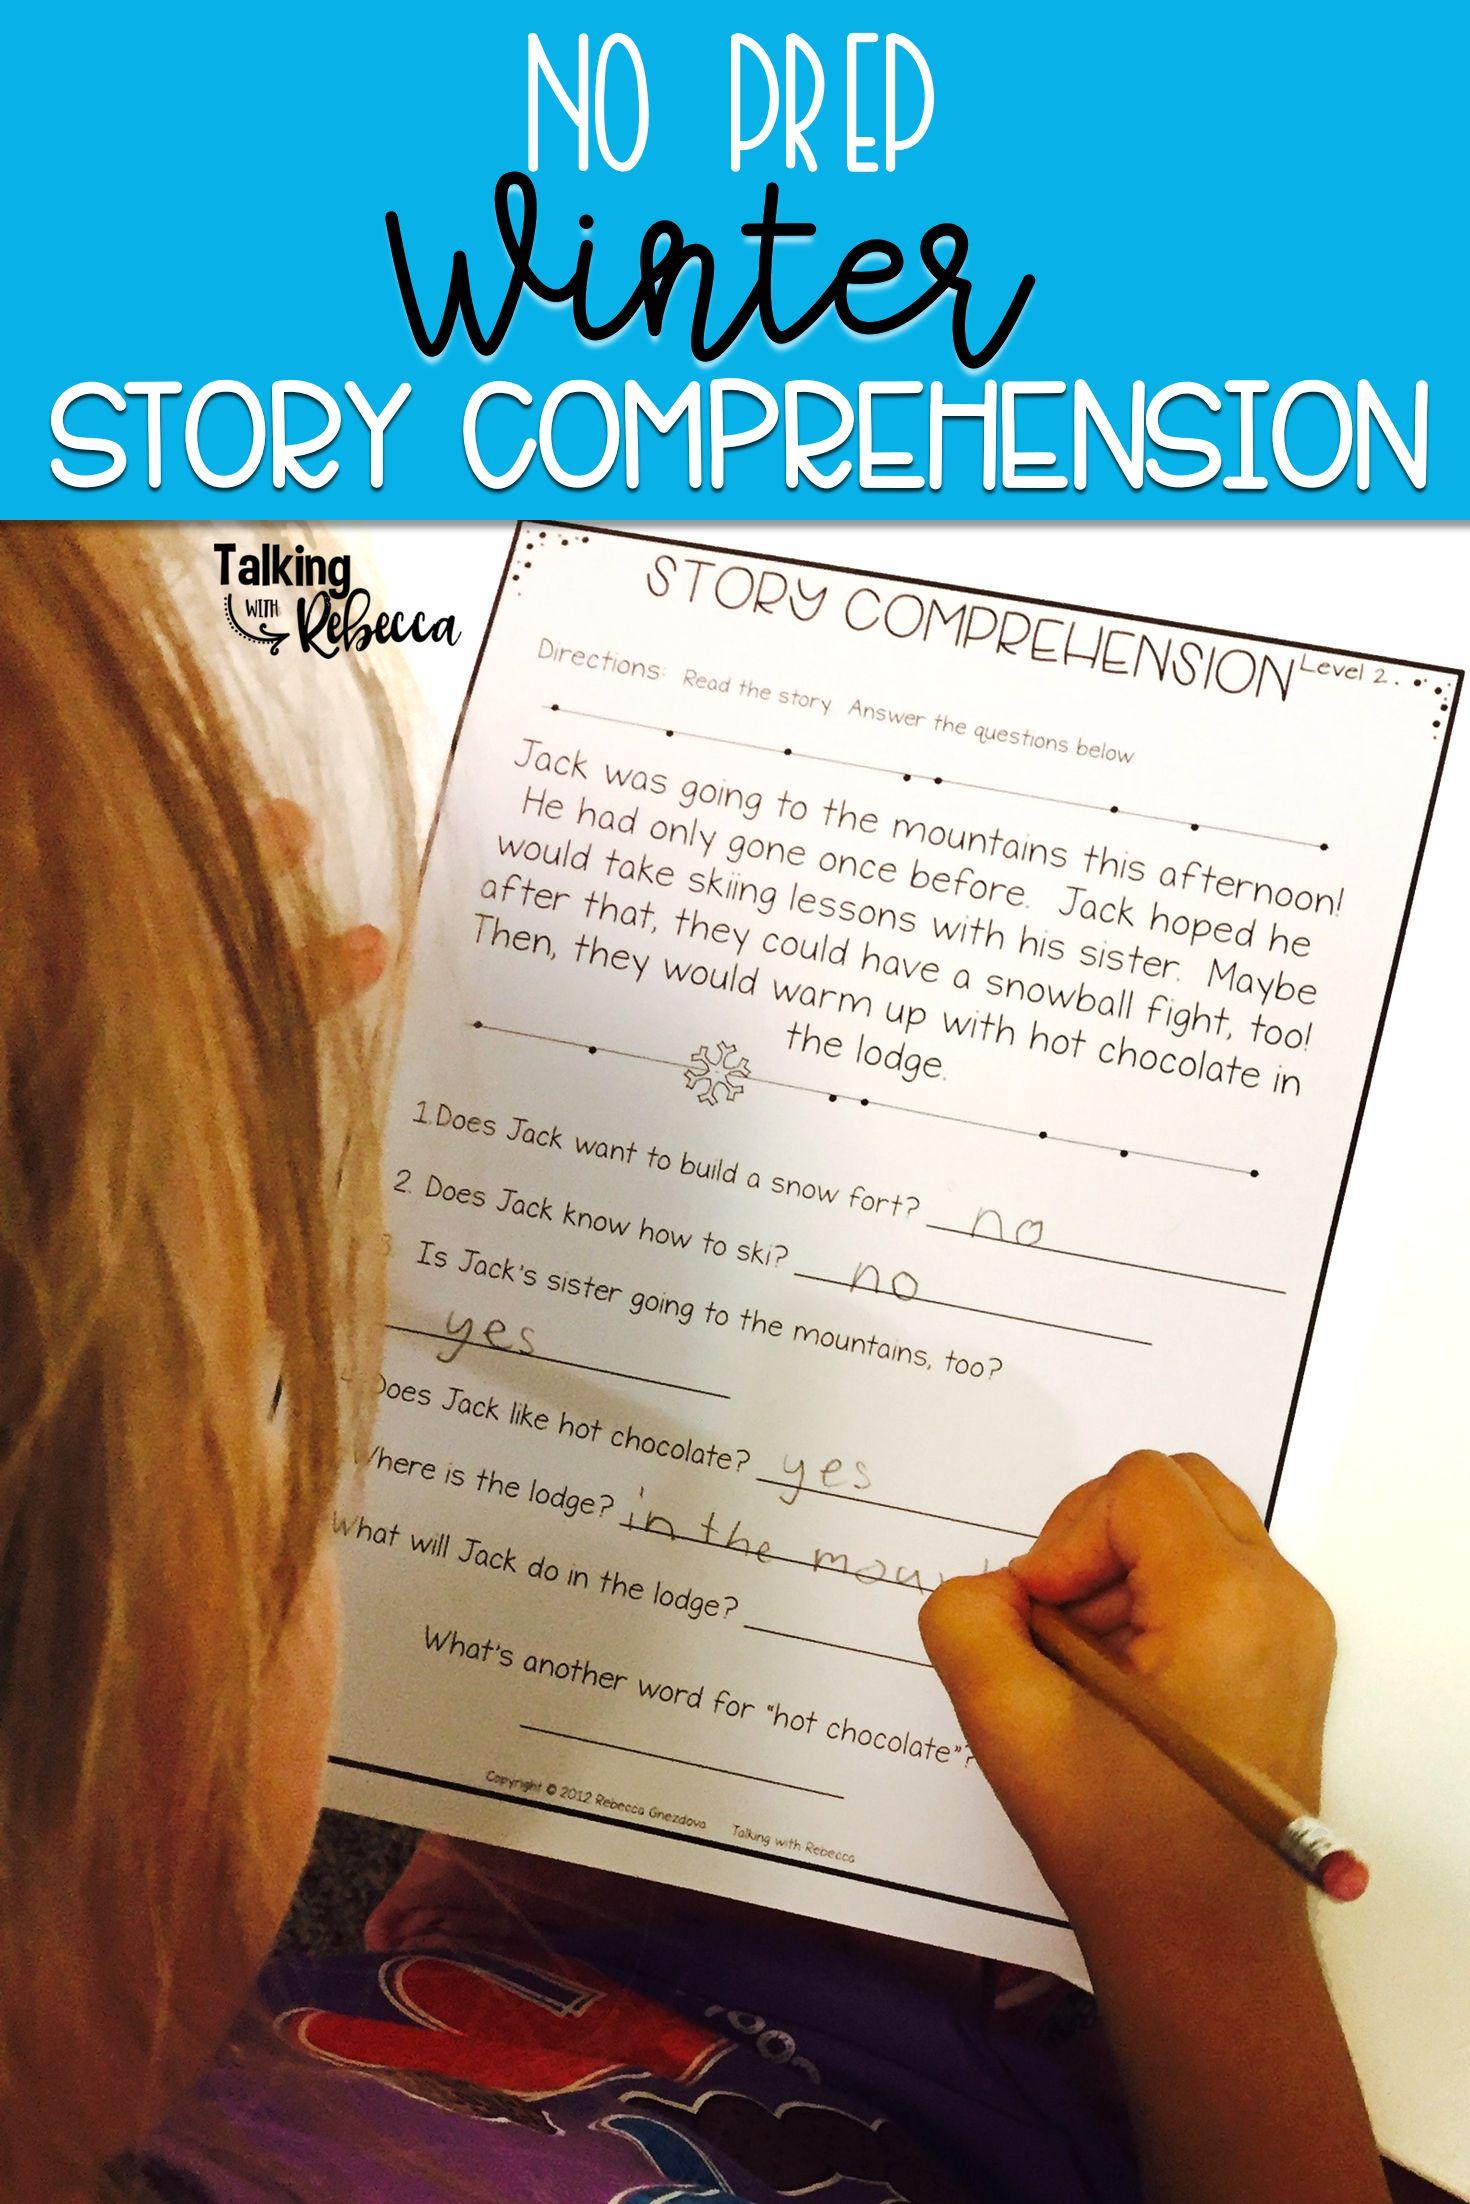 Winter Story Comprehension Worksheets